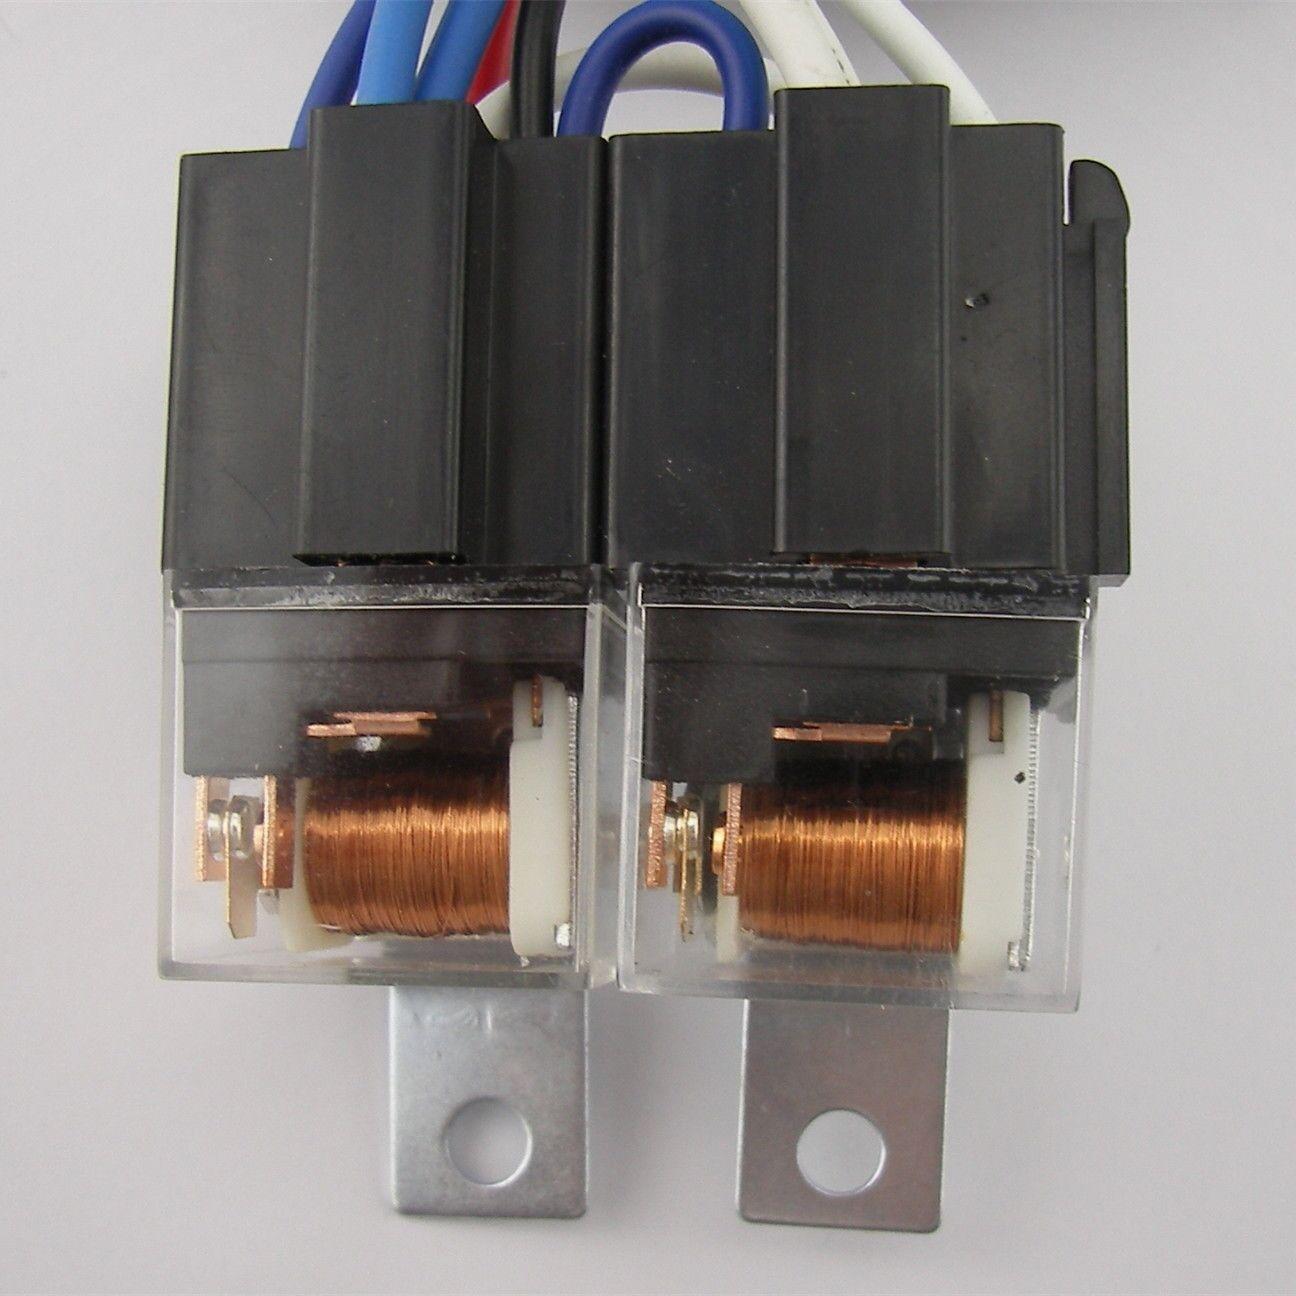 4 Headlight Relay Wiring Harness H4 Headlamp Light Bulb Ceramic A 2 Of 12 Socket Plugs Set 3